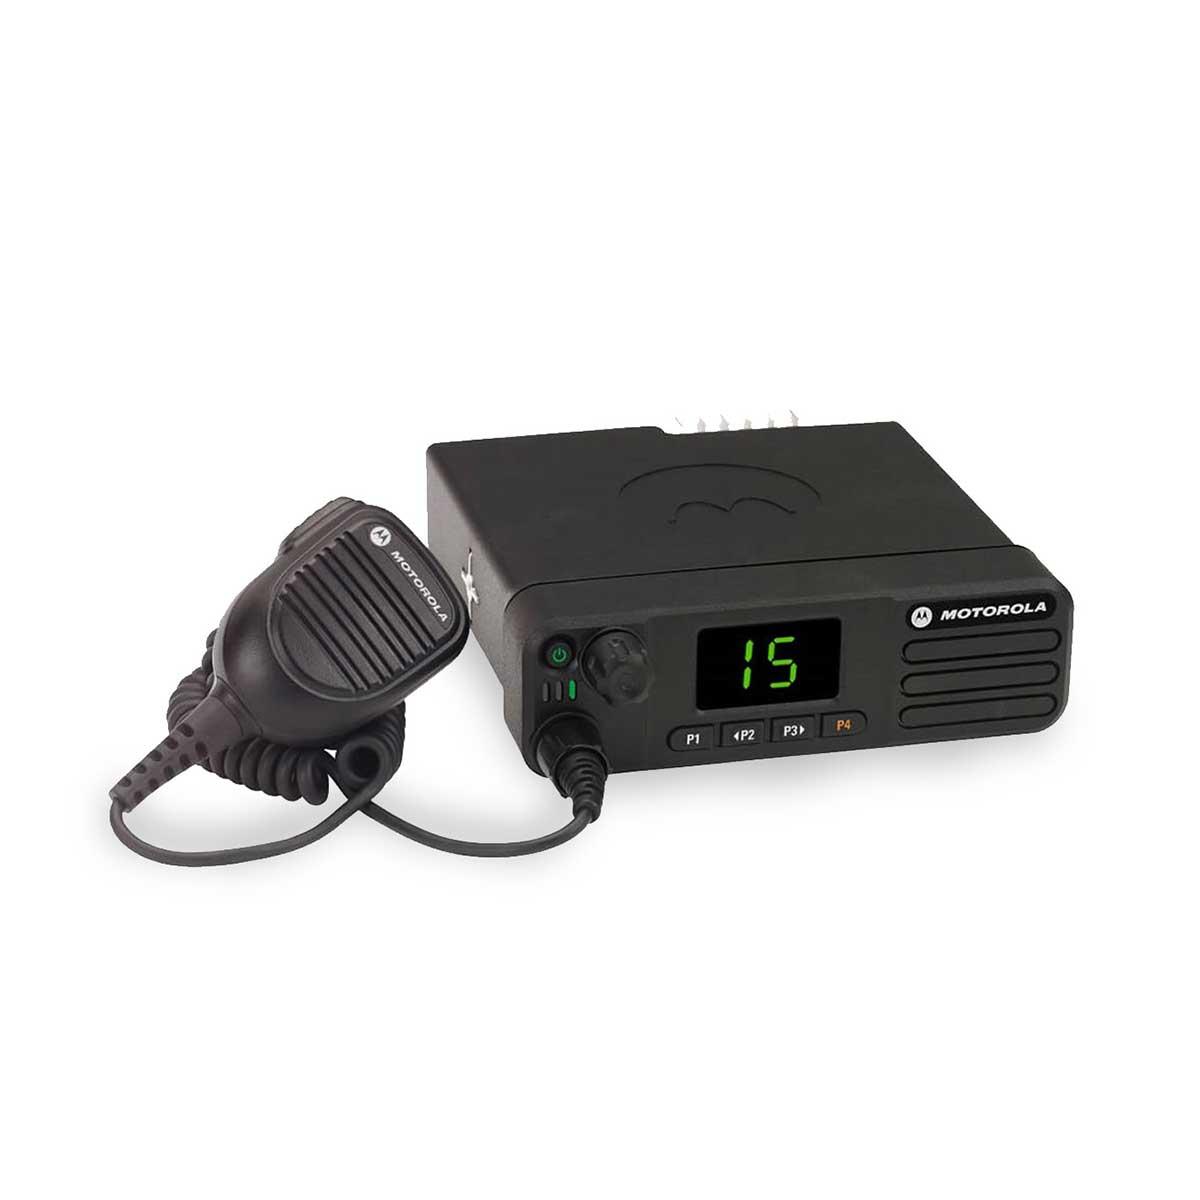 Radio Motorola DGM8000 Digital LAM28JNC9KA1AN VHF 136-174MHZ de 25W